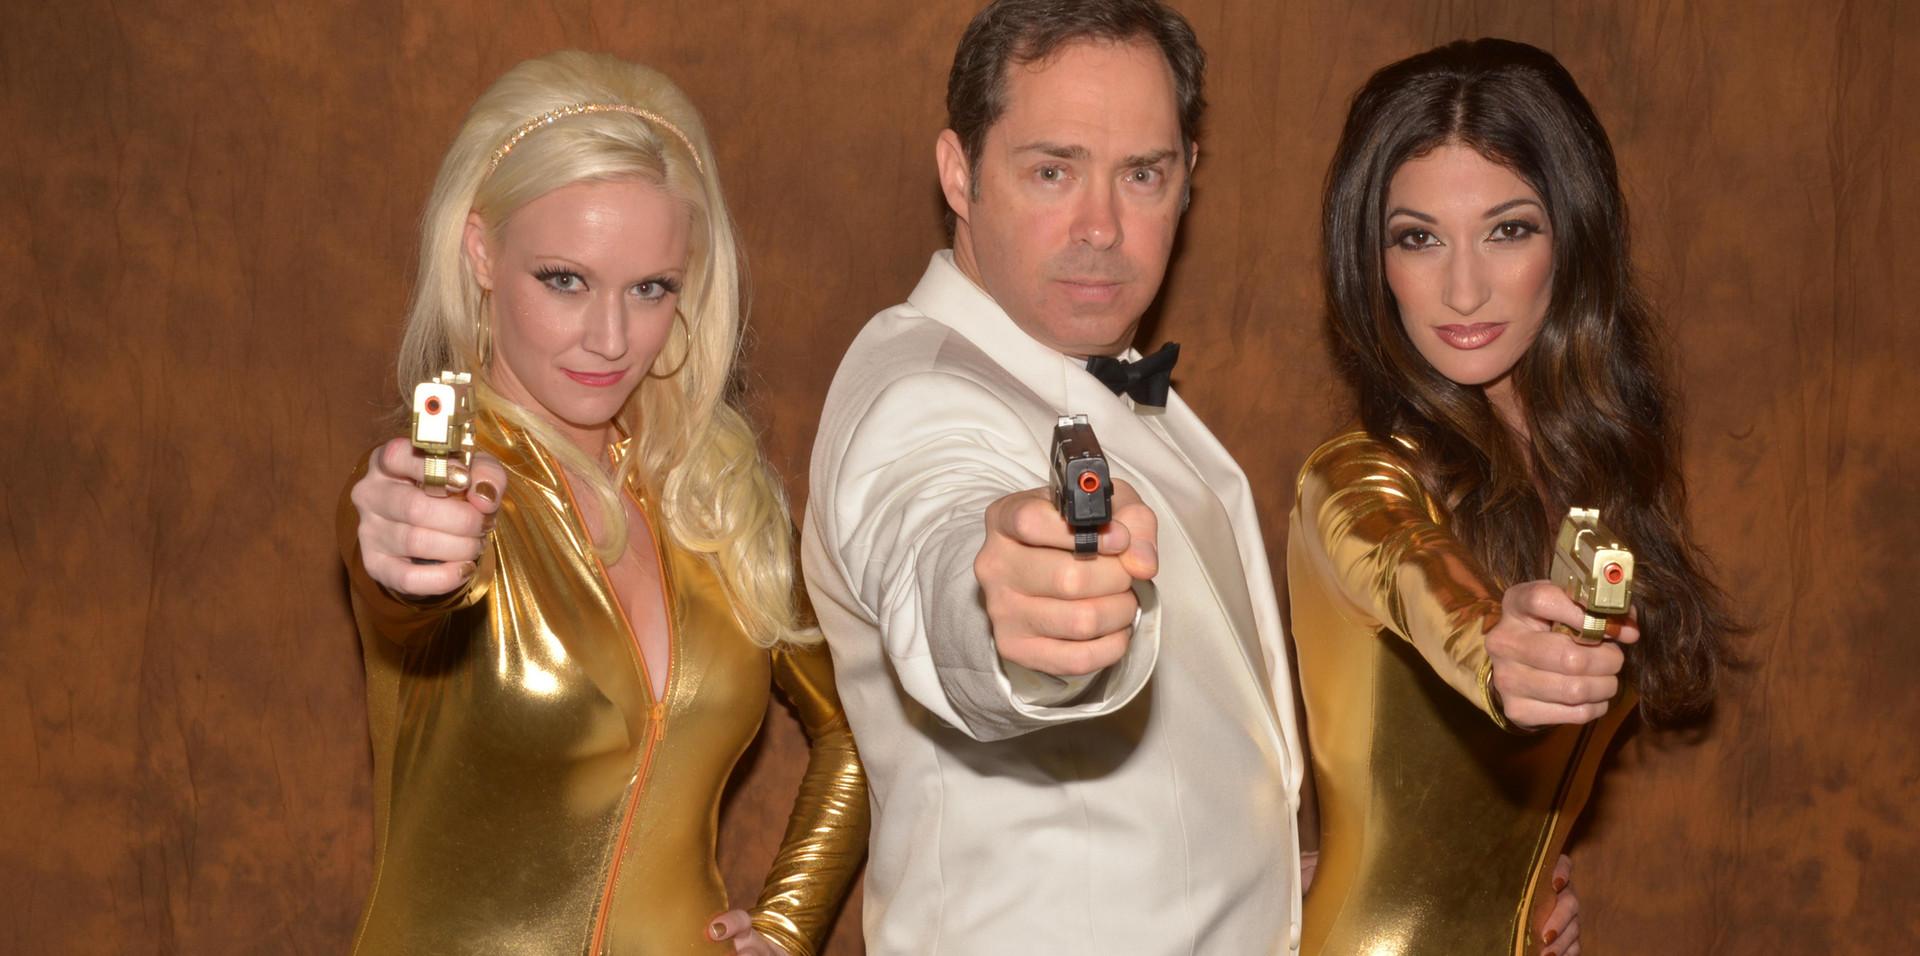 James Bond Murder Mystery Bond and Bond